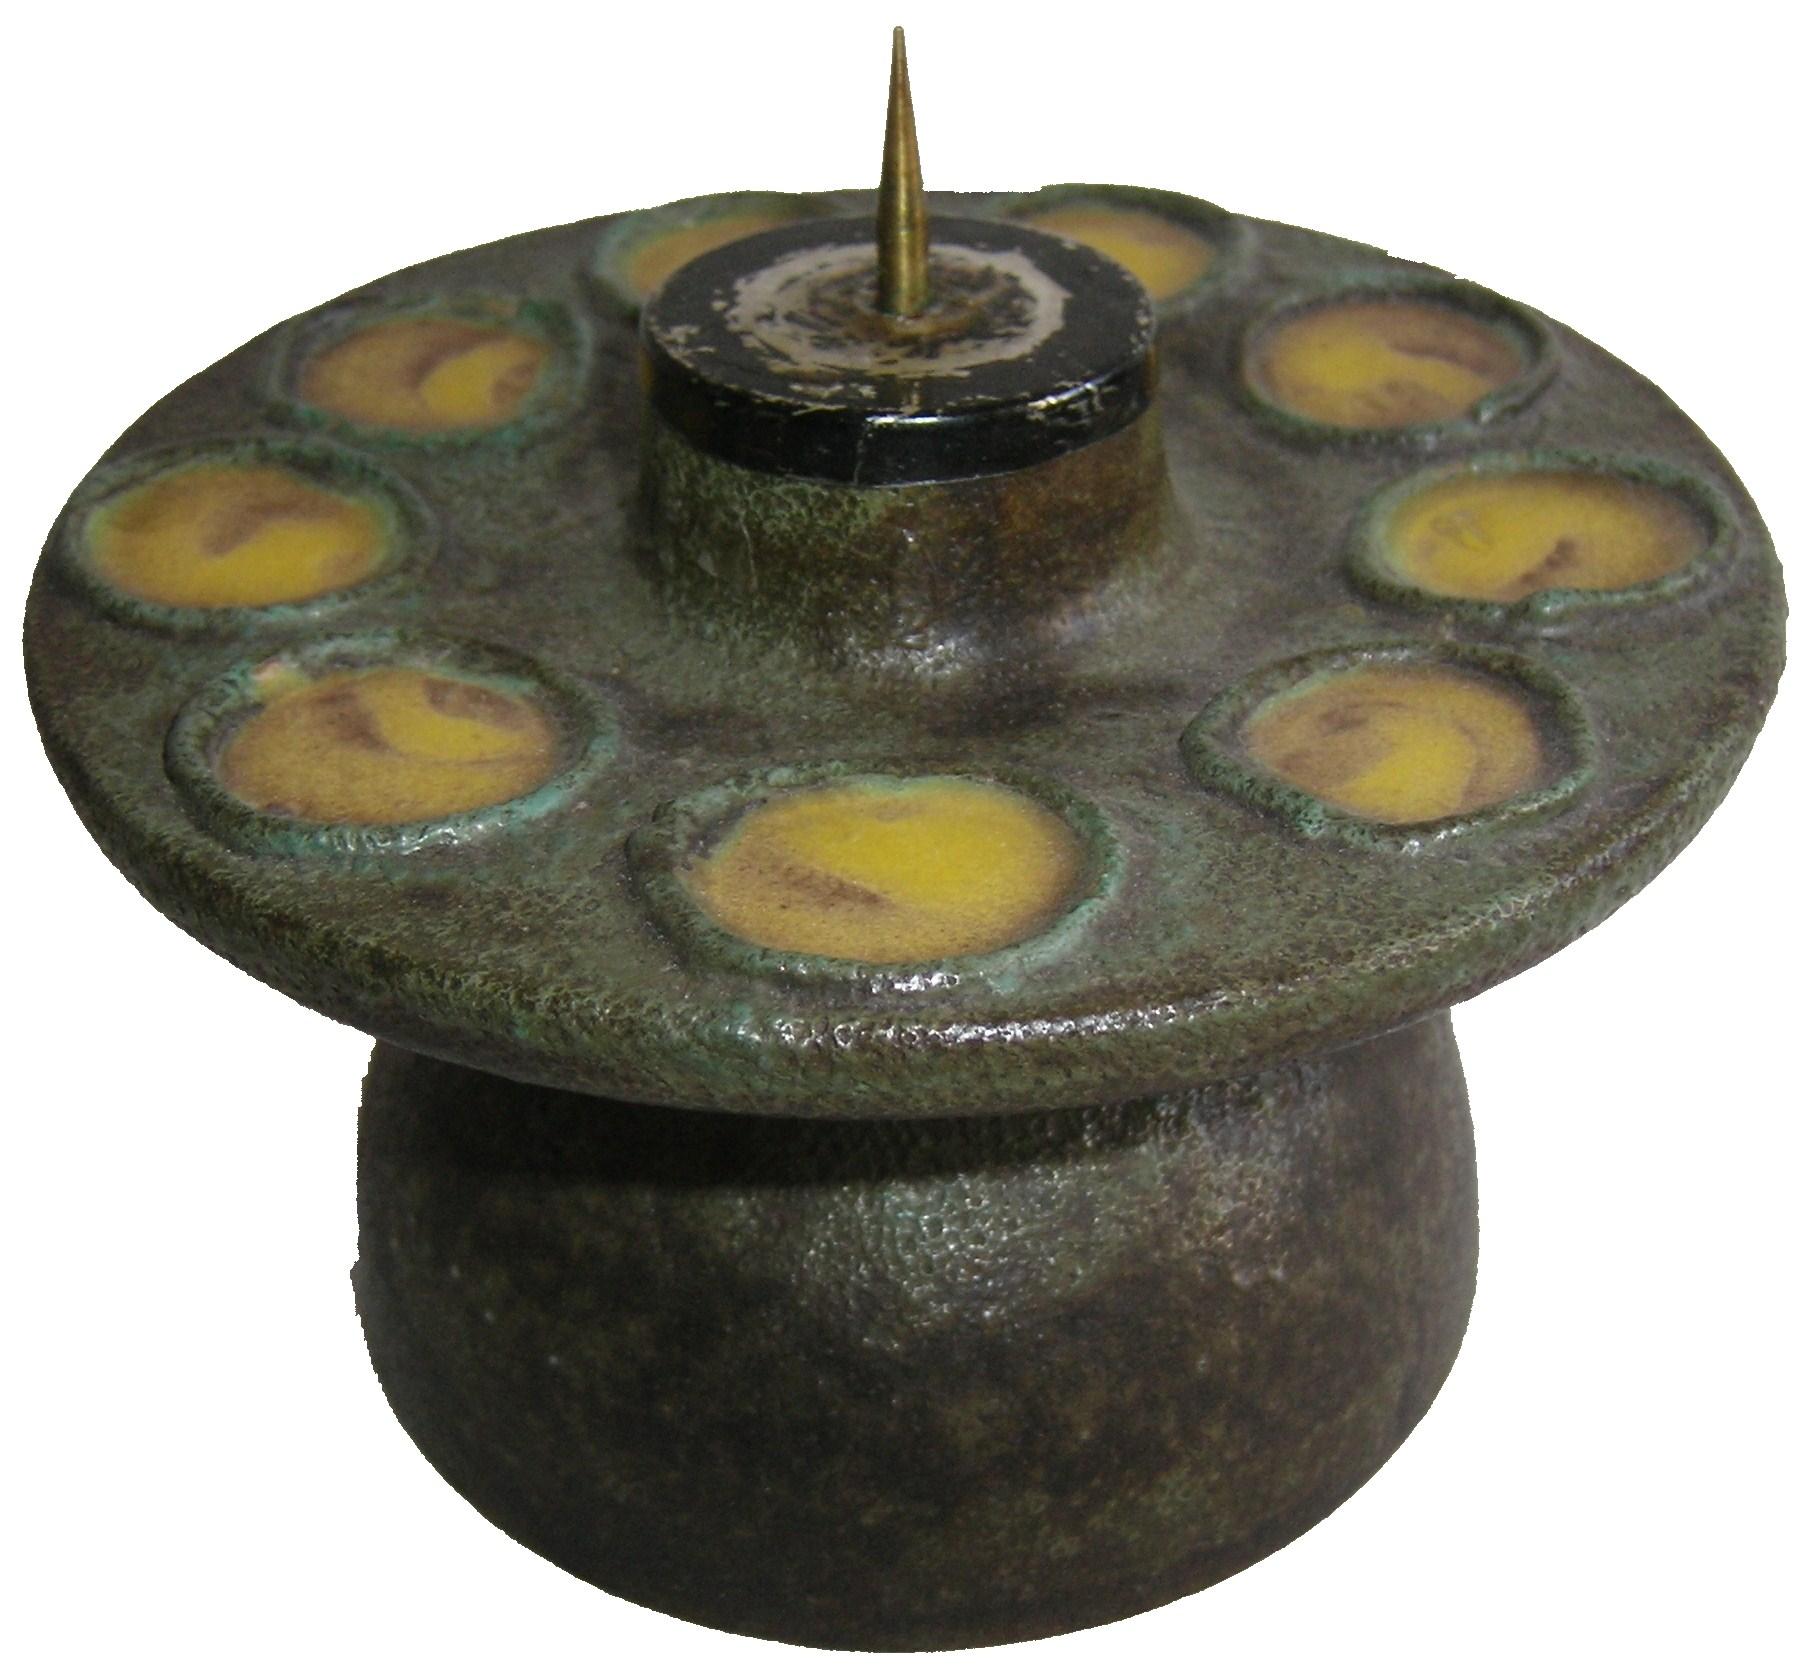 ceramano keramik glaze decor designers series pots and pots. Black Bedroom Furniture Sets. Home Design Ideas